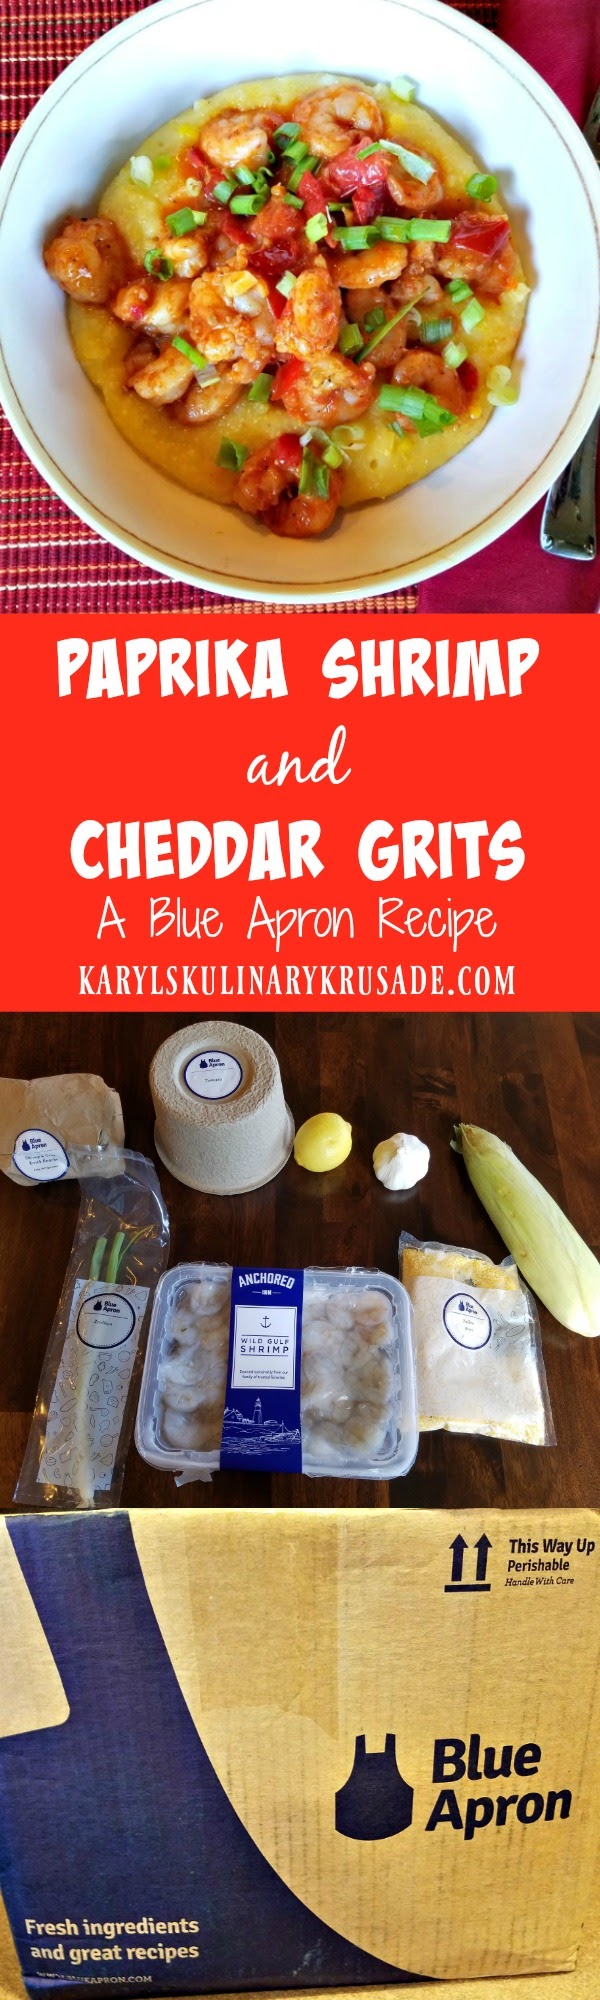 Blue apron yellow grits - Paprika Shrimp And Cheddar Grits Karyl S Kulinary Krusade